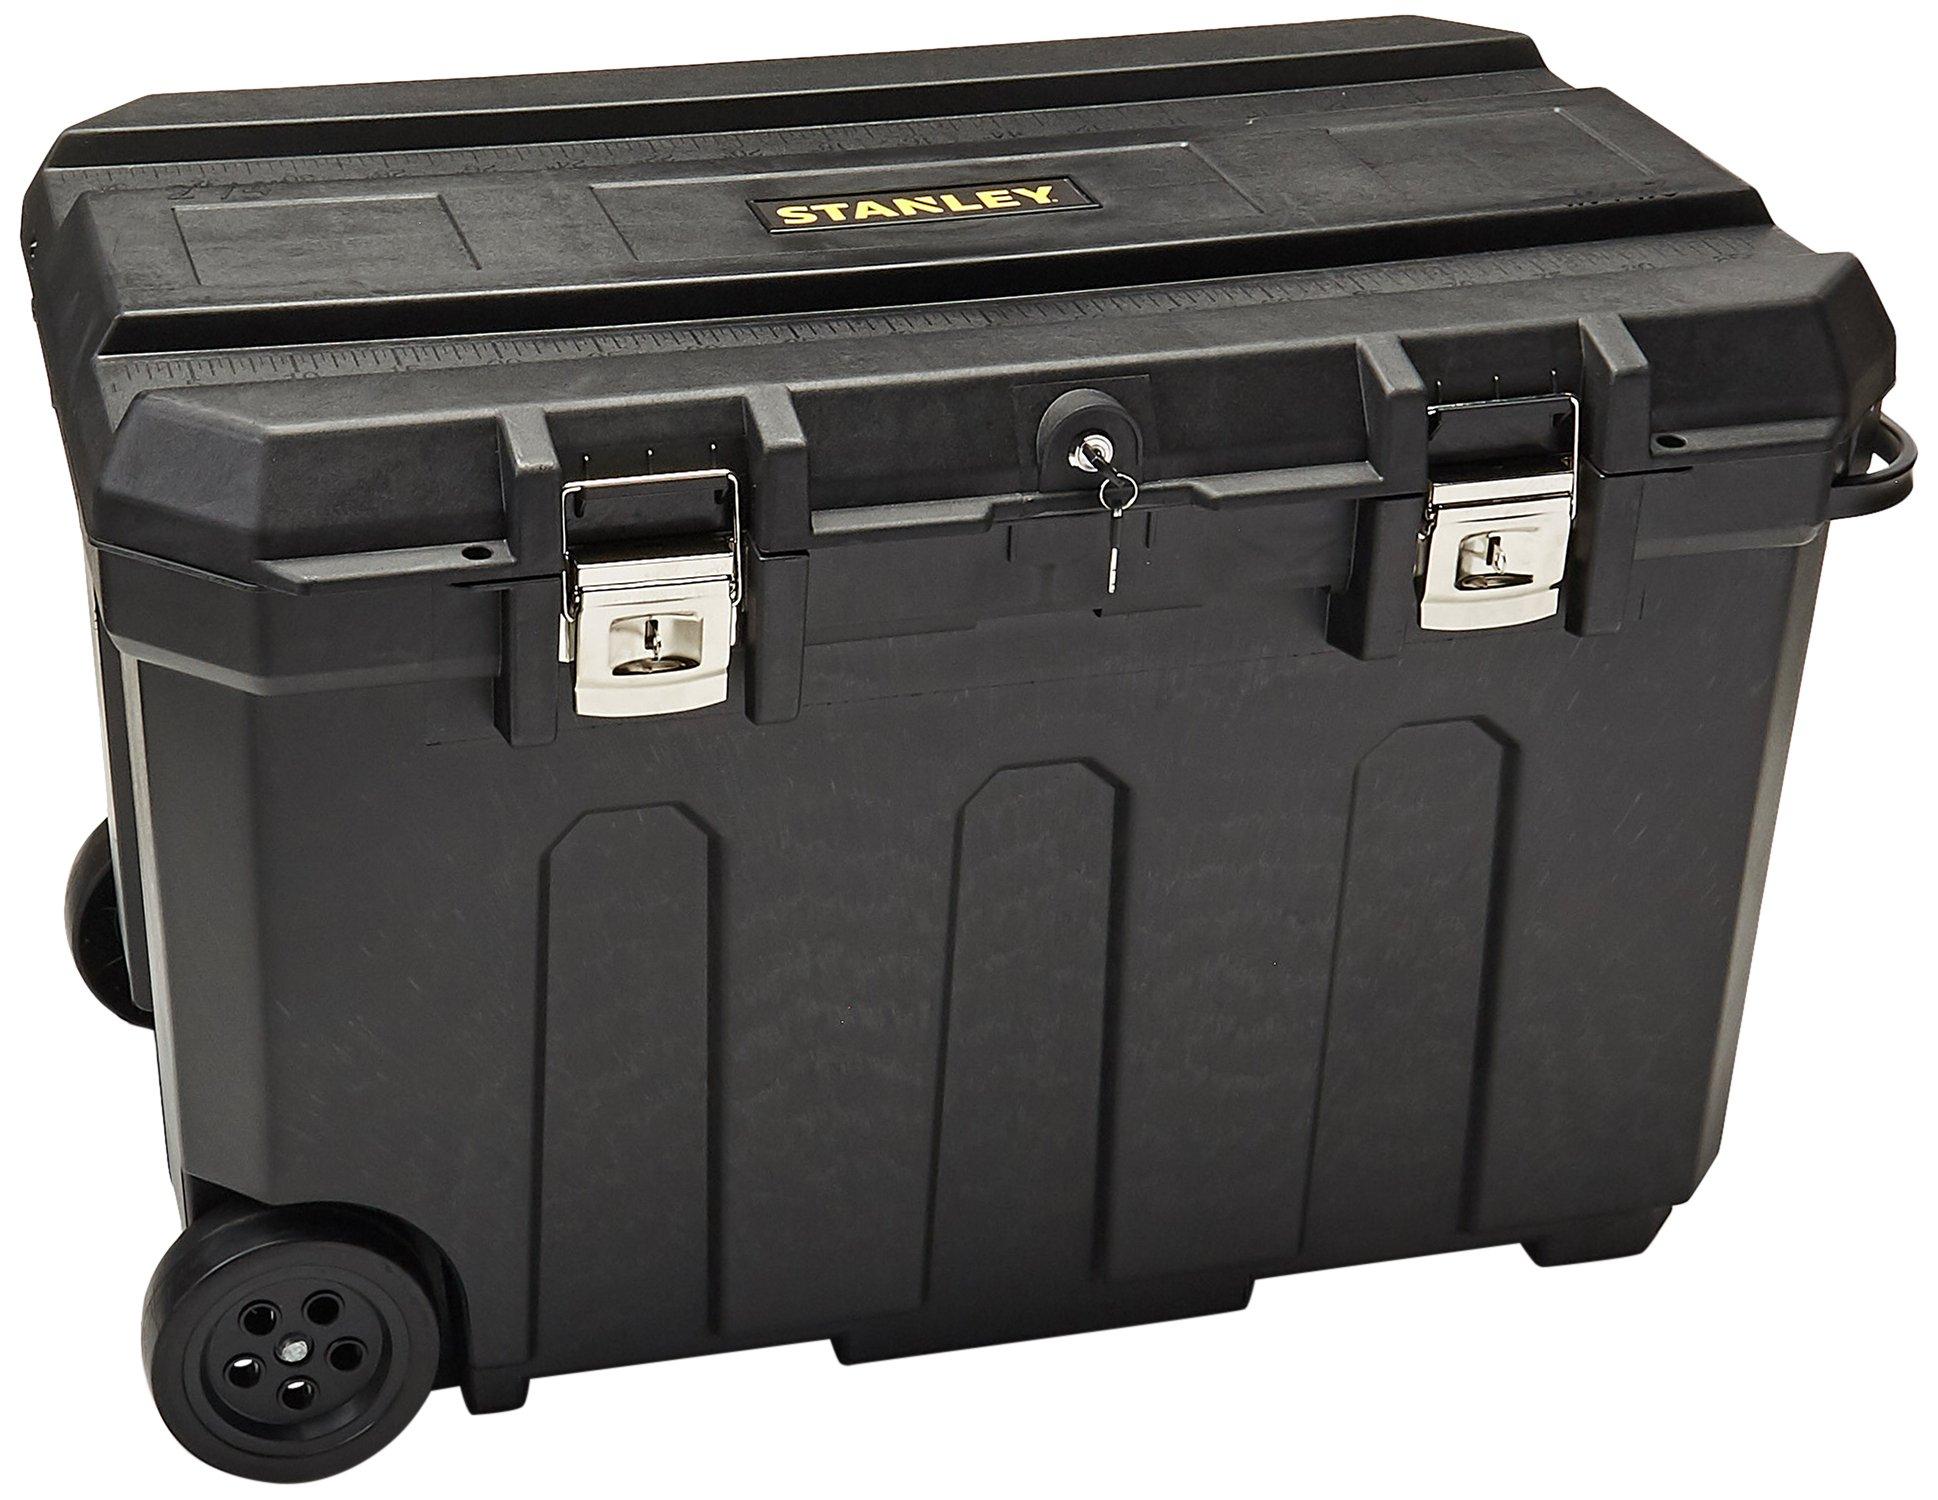 Stanley 037025H 50 Gallon Mobile Chest